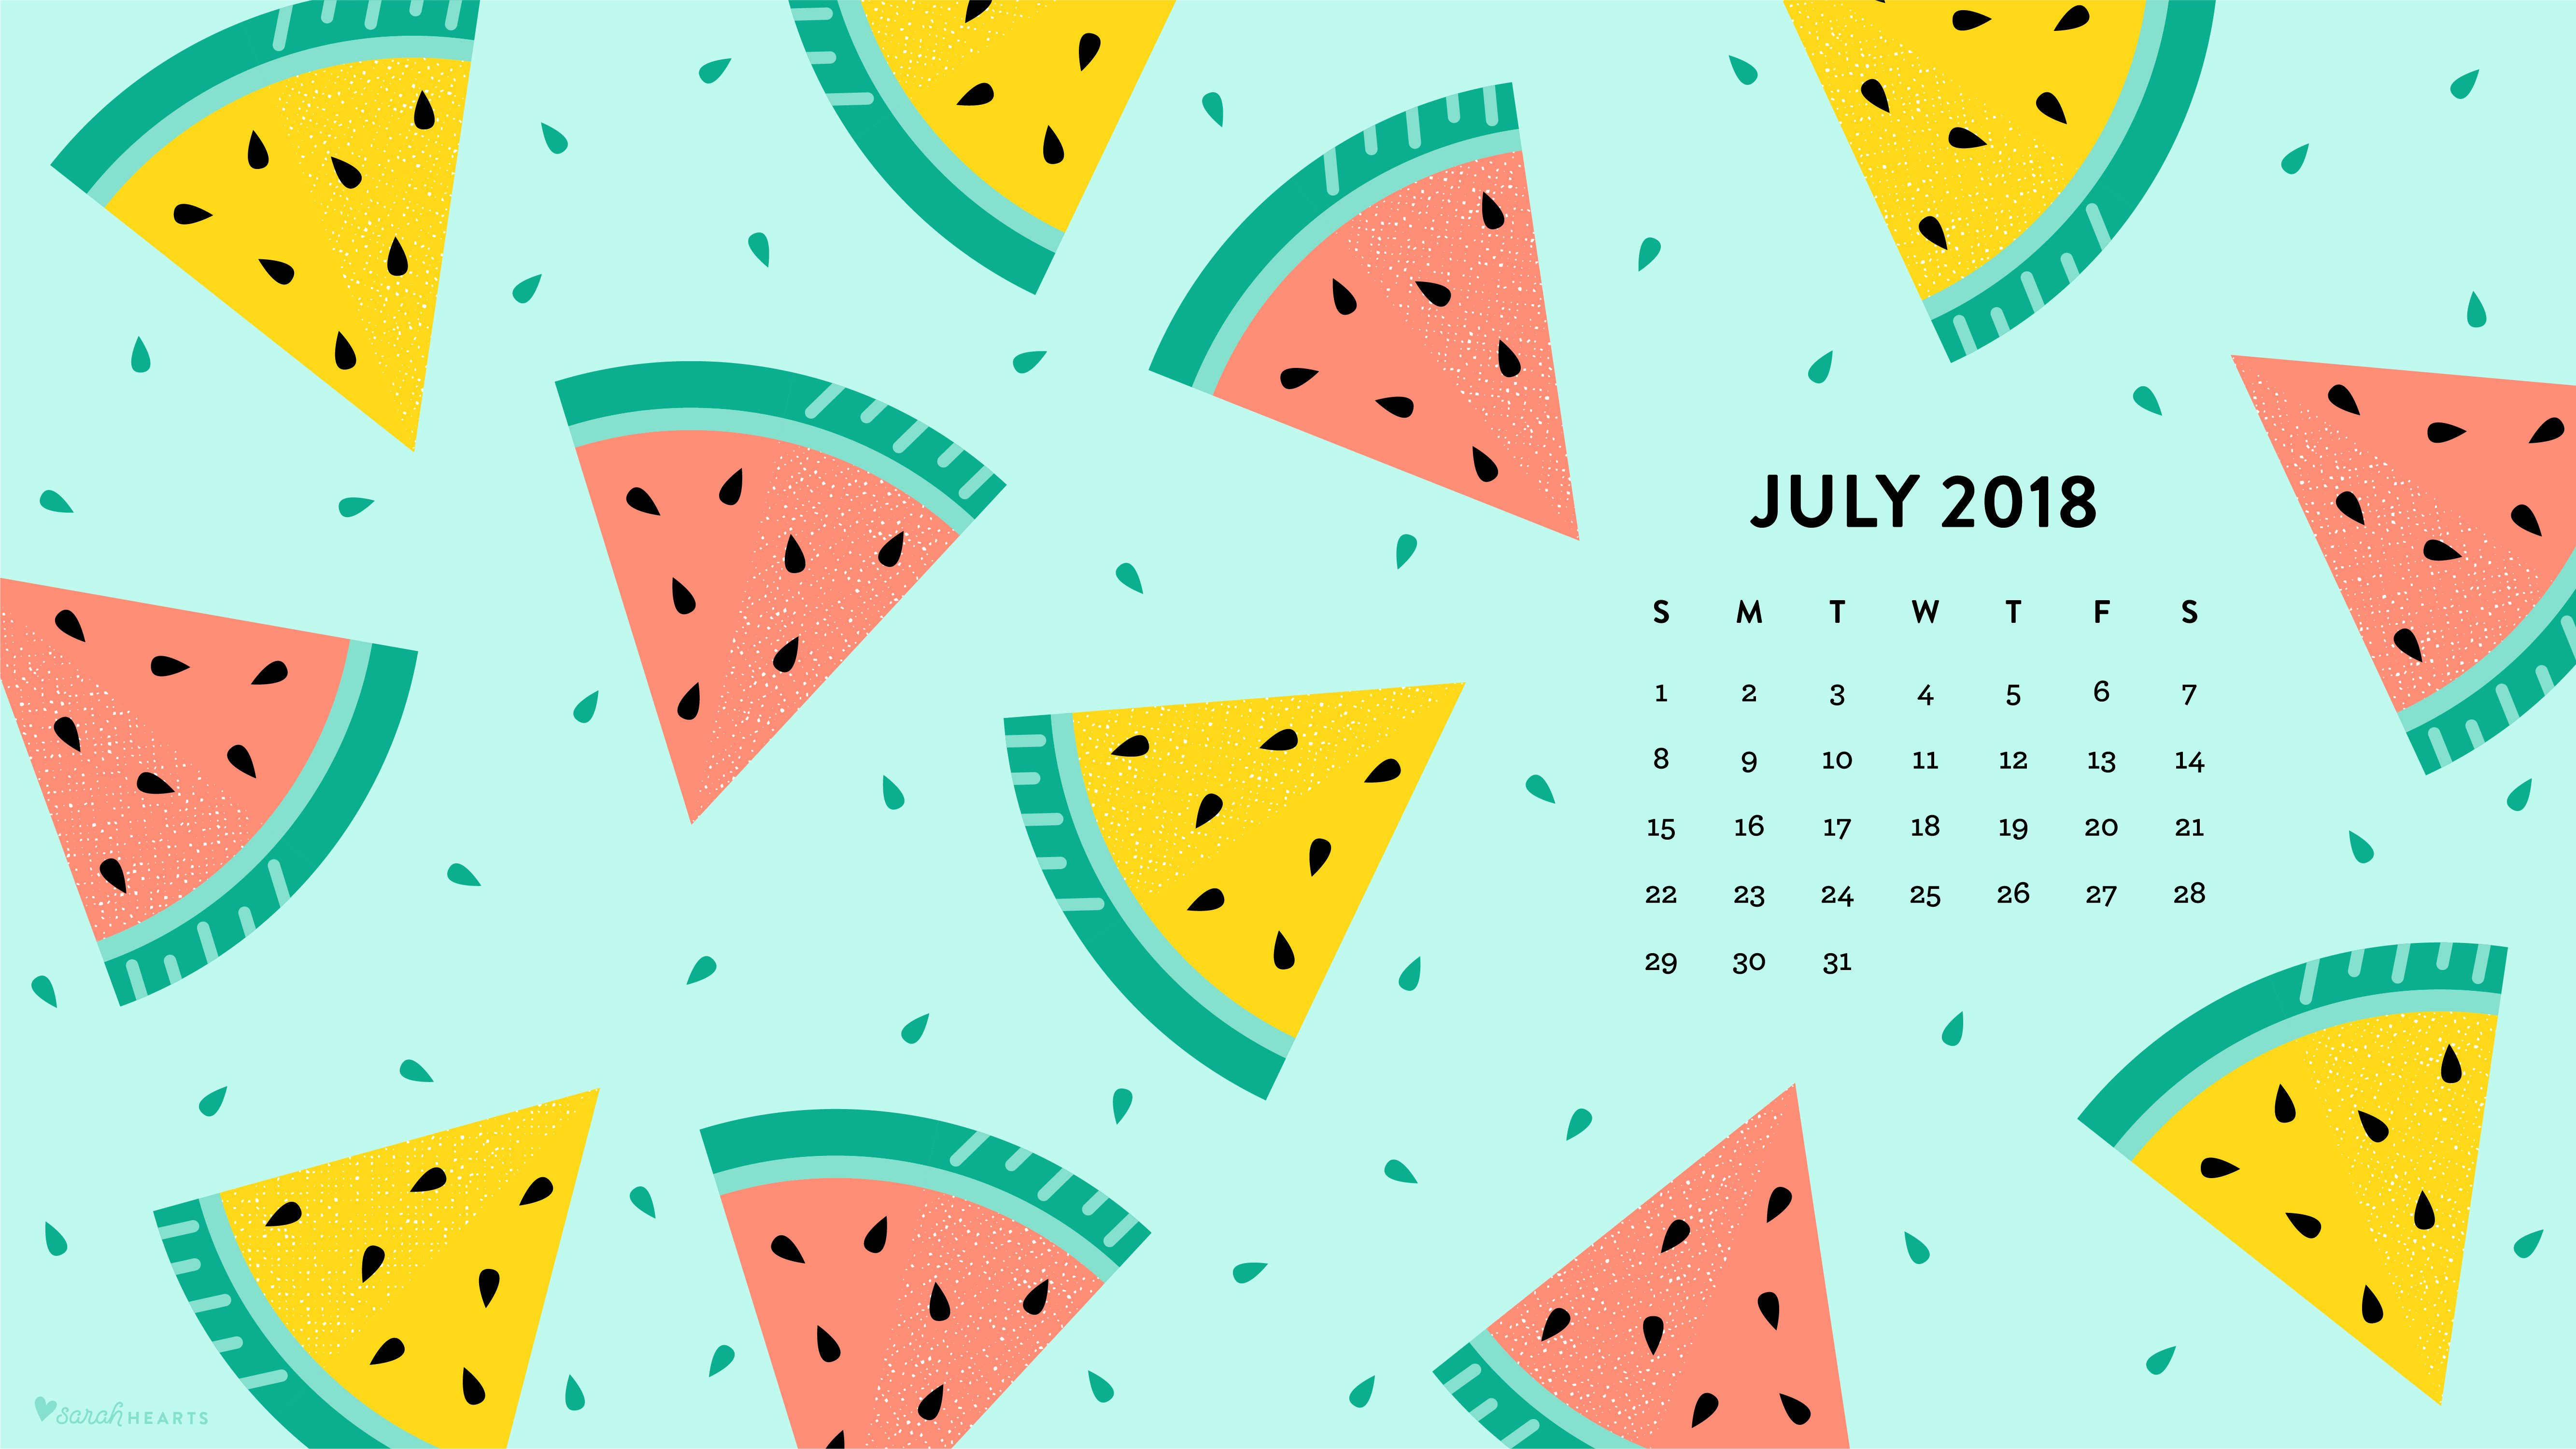 July 2018 Watermelon Calendar Wallpaper   Sarah Hearts 5334x3001